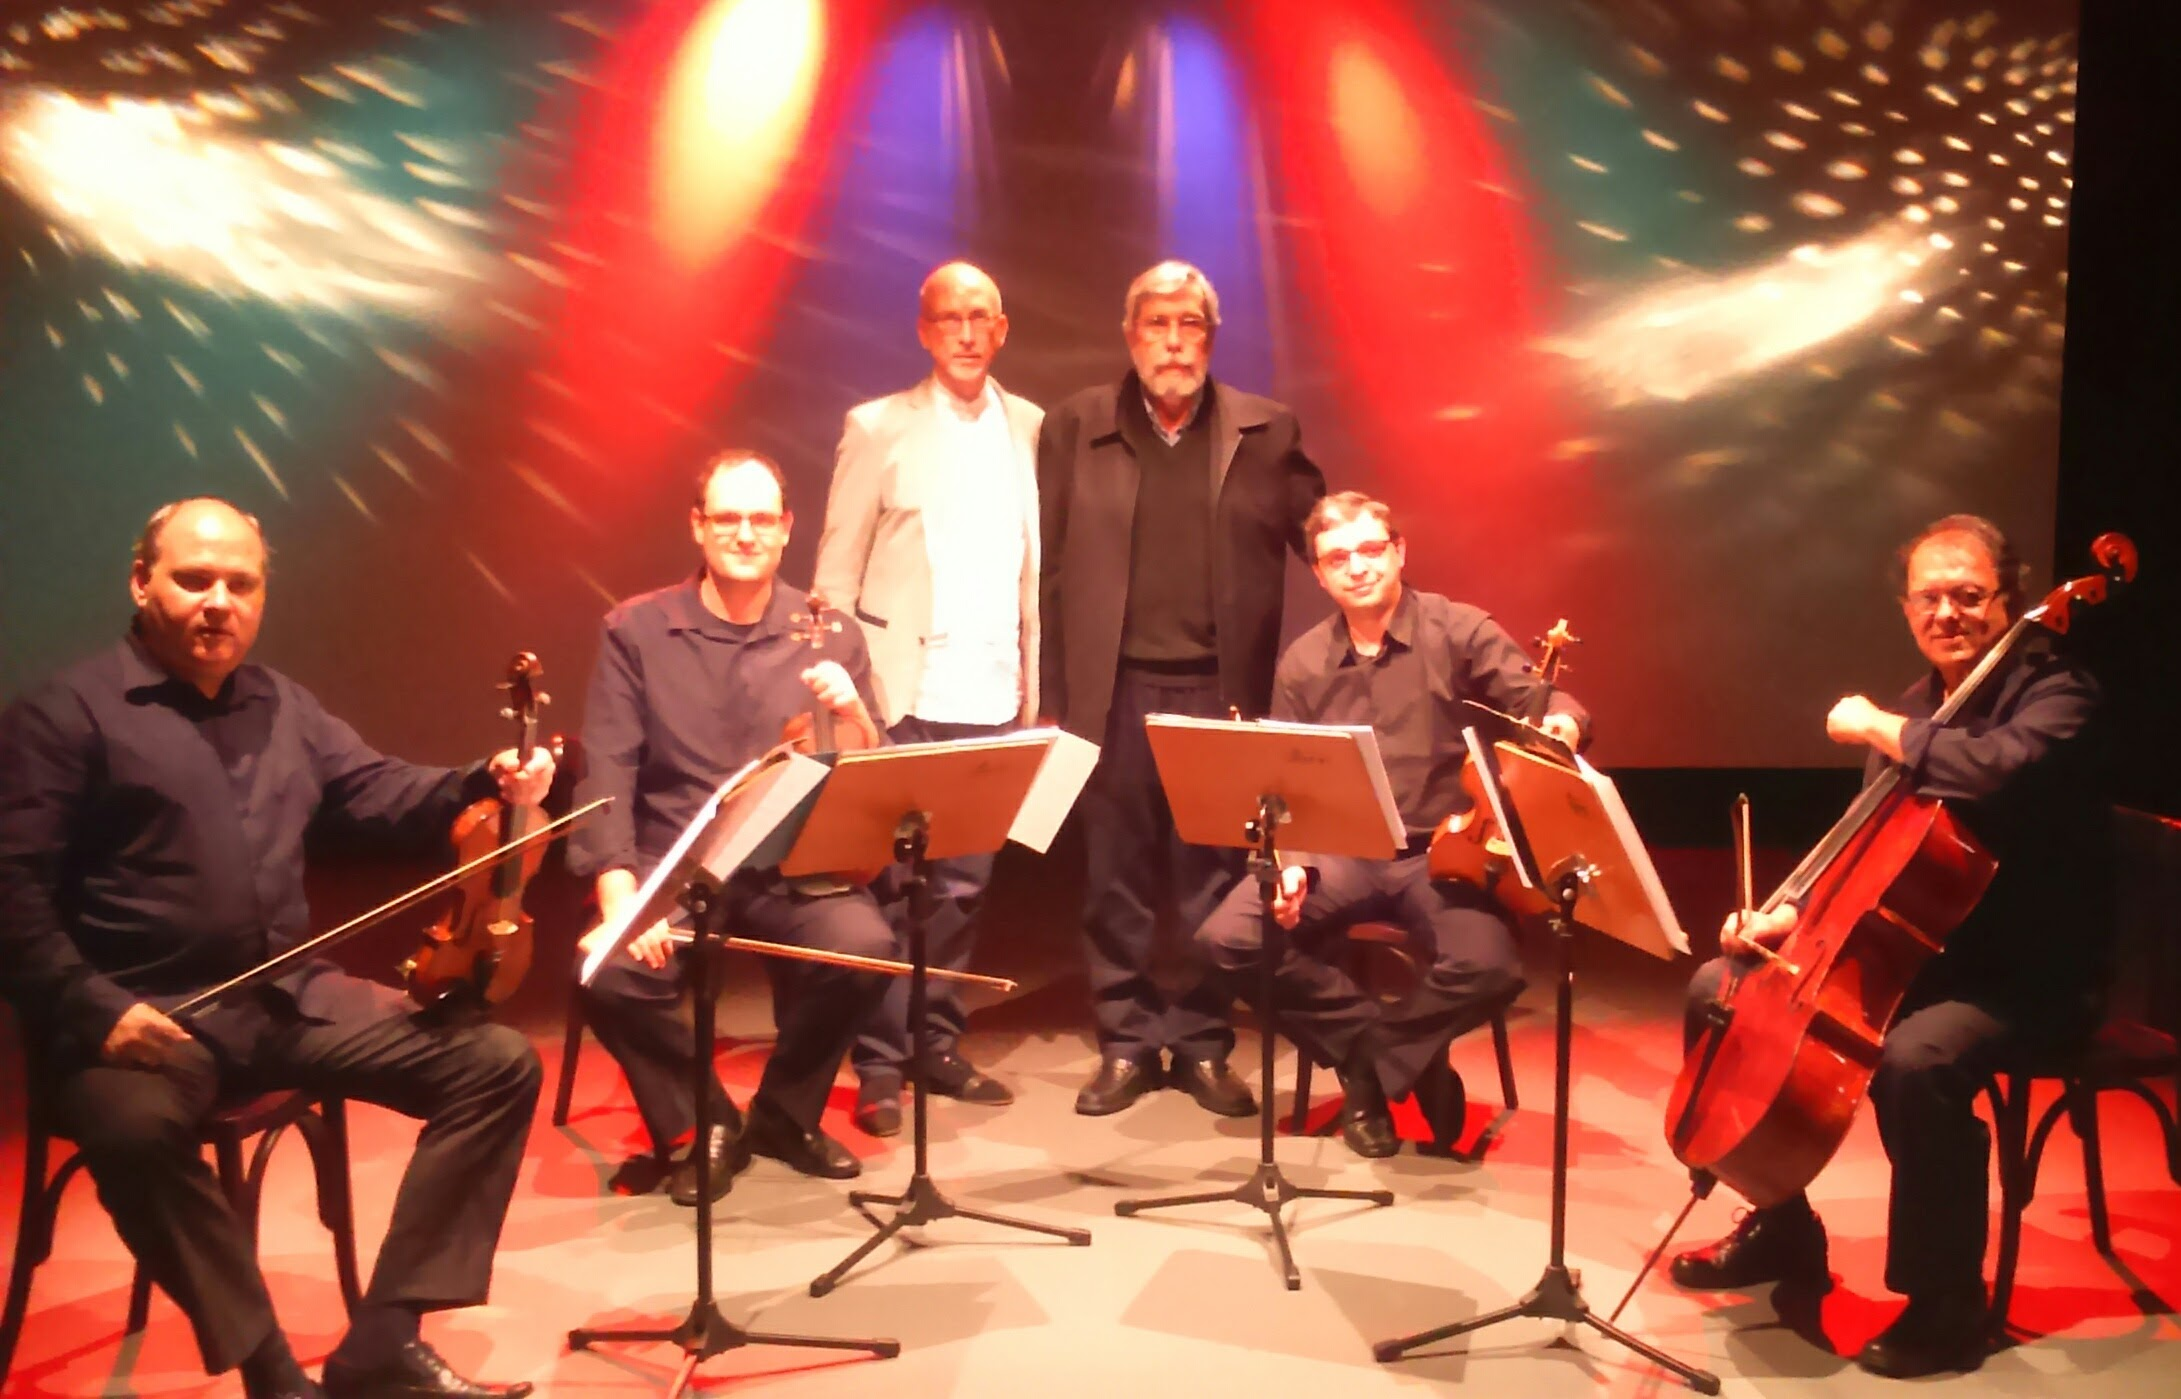 Concerto Marco padilha